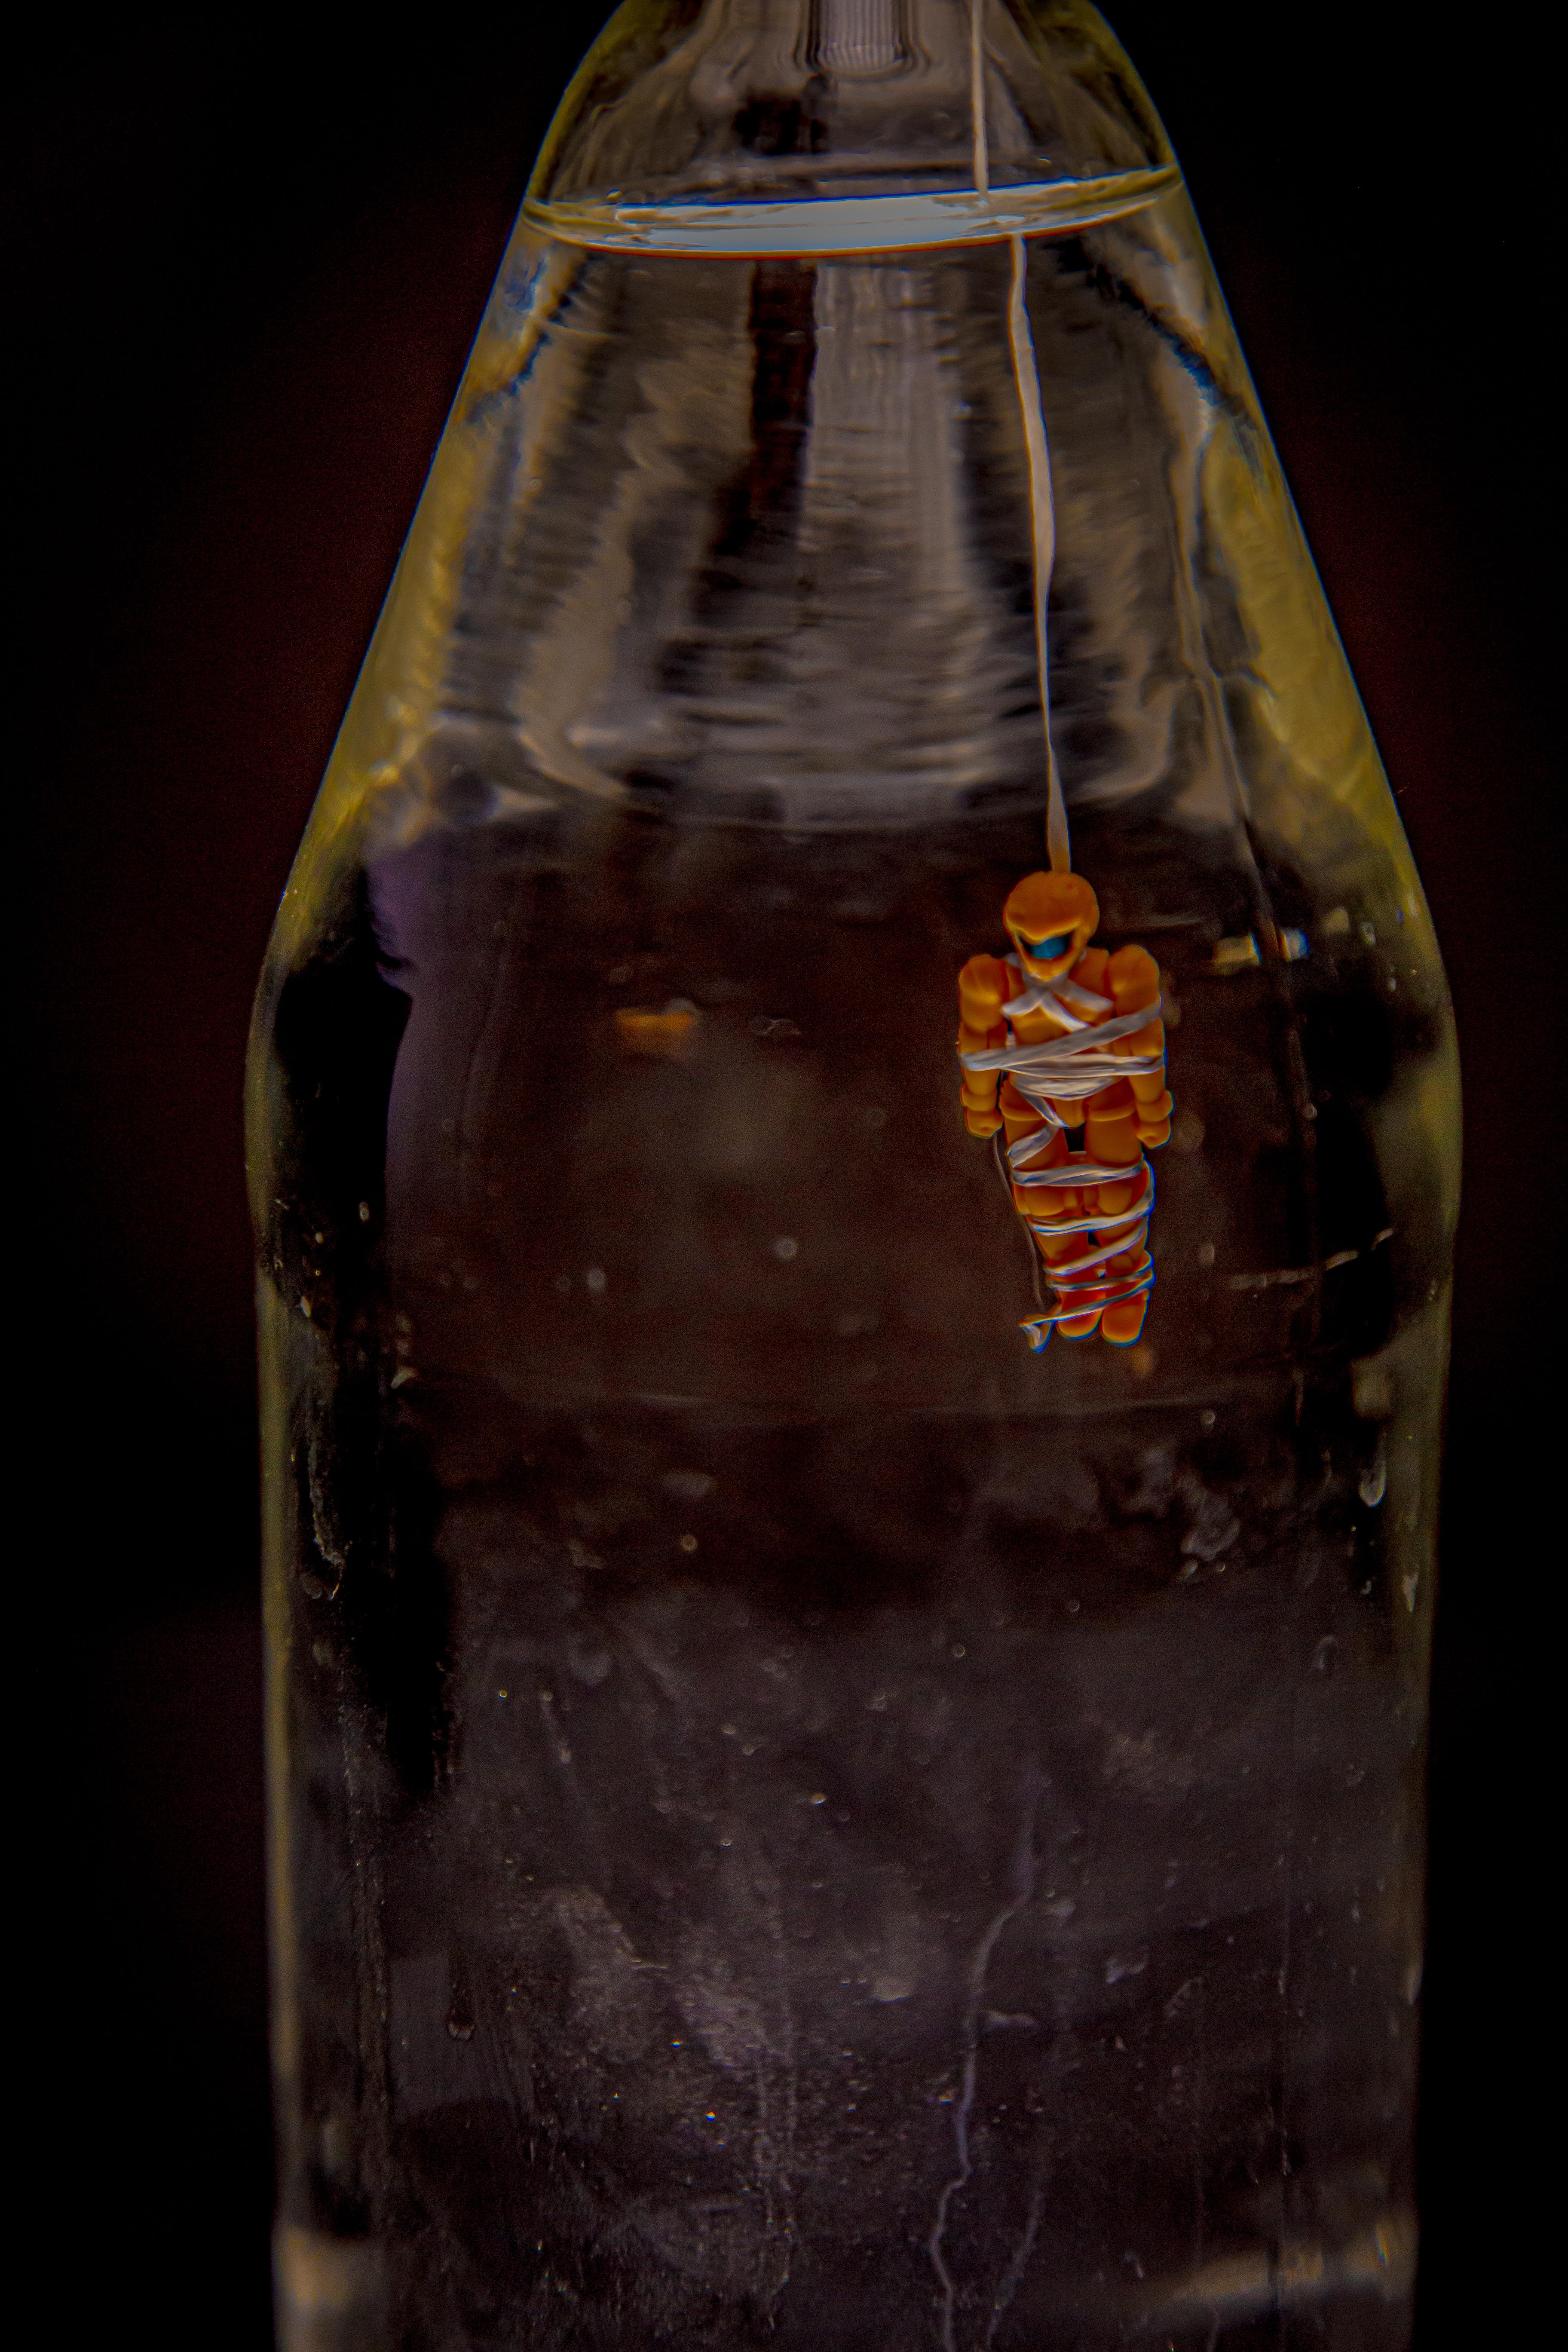 BottledHumanity-34